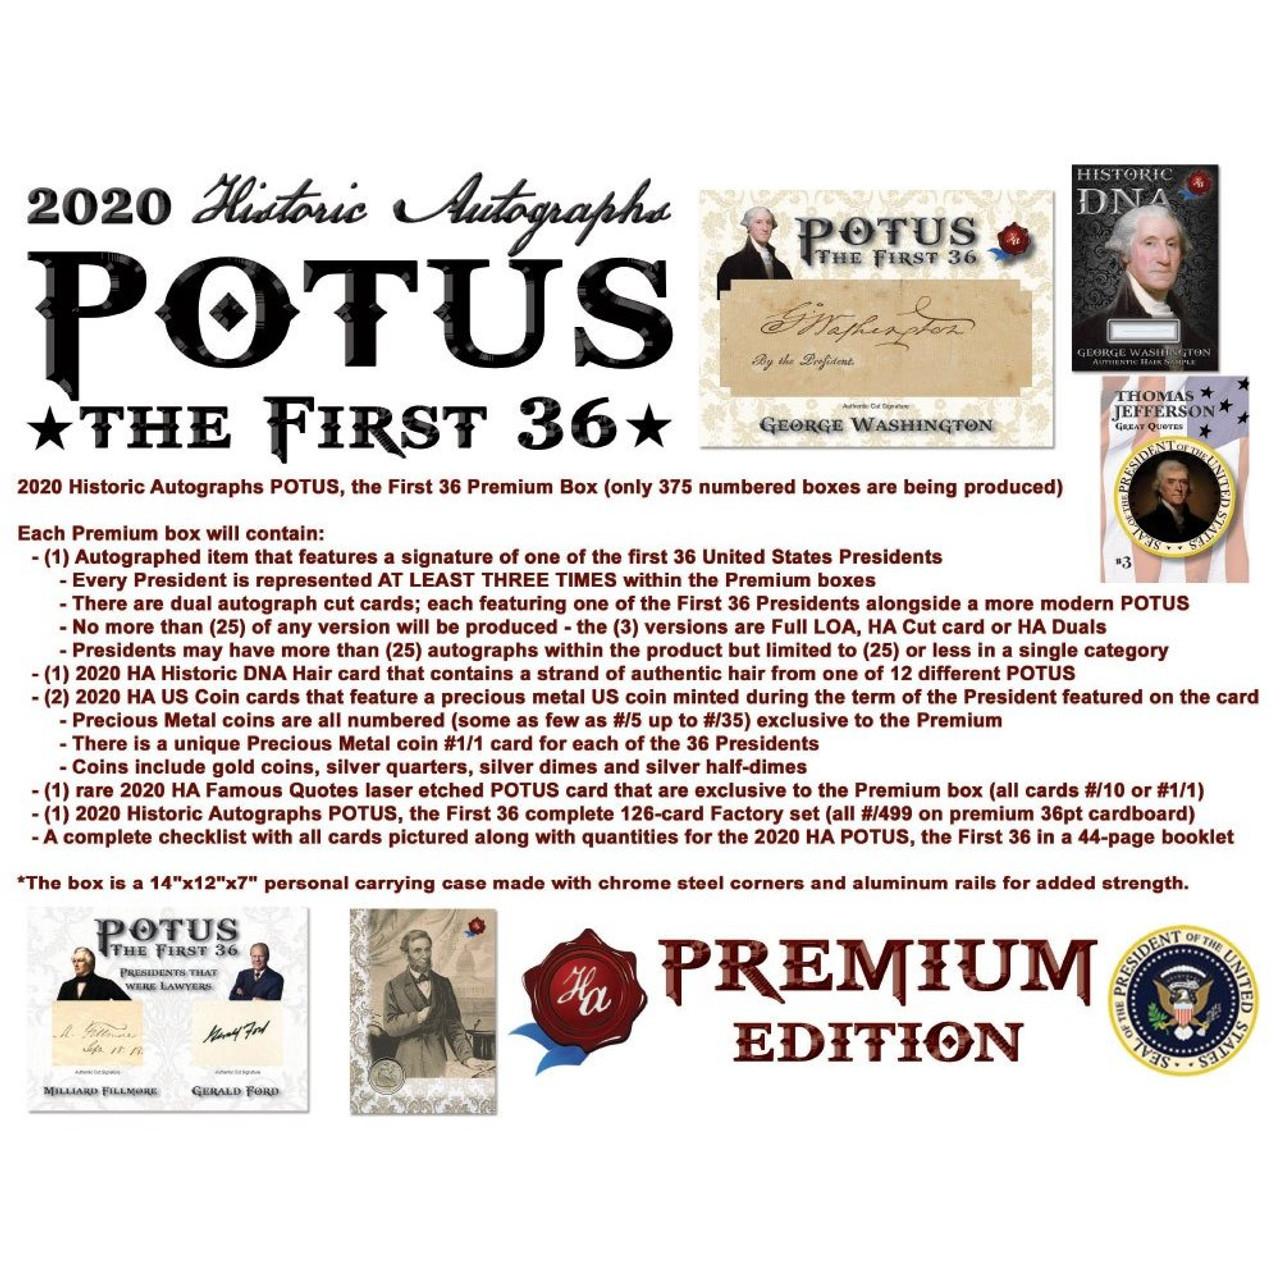 2020 Historic Autographs POTUS The First 36 Premium Box